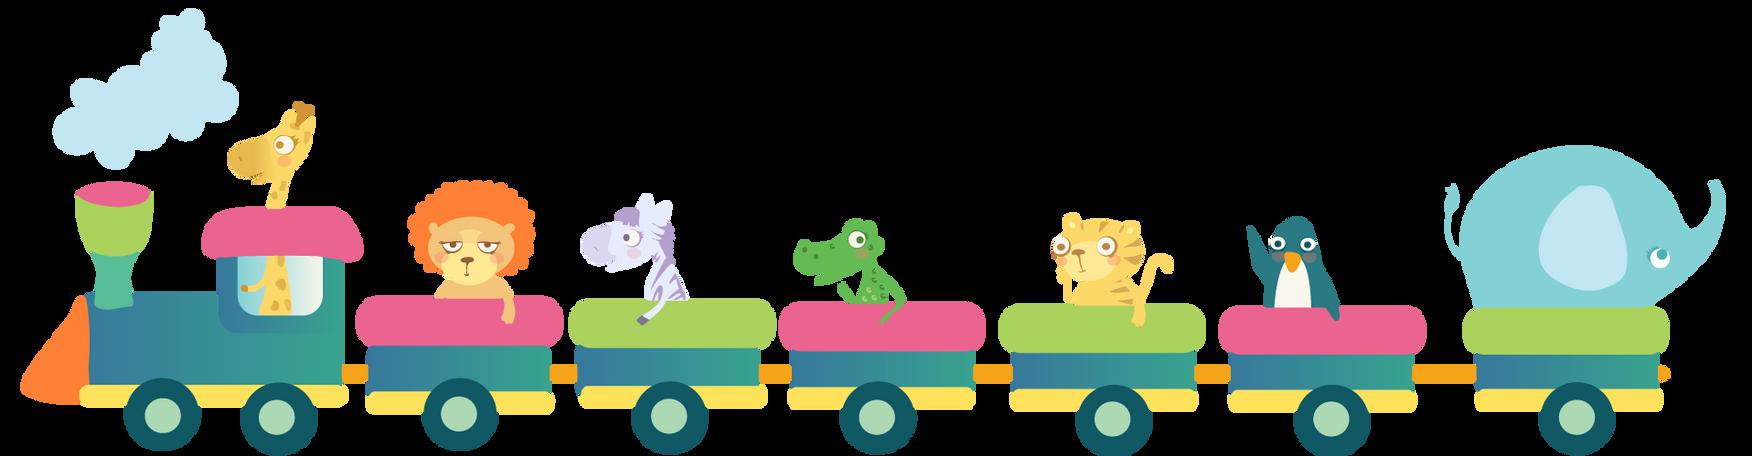 Little Boys Toys Border : Little cute train by mairimart on deviantart